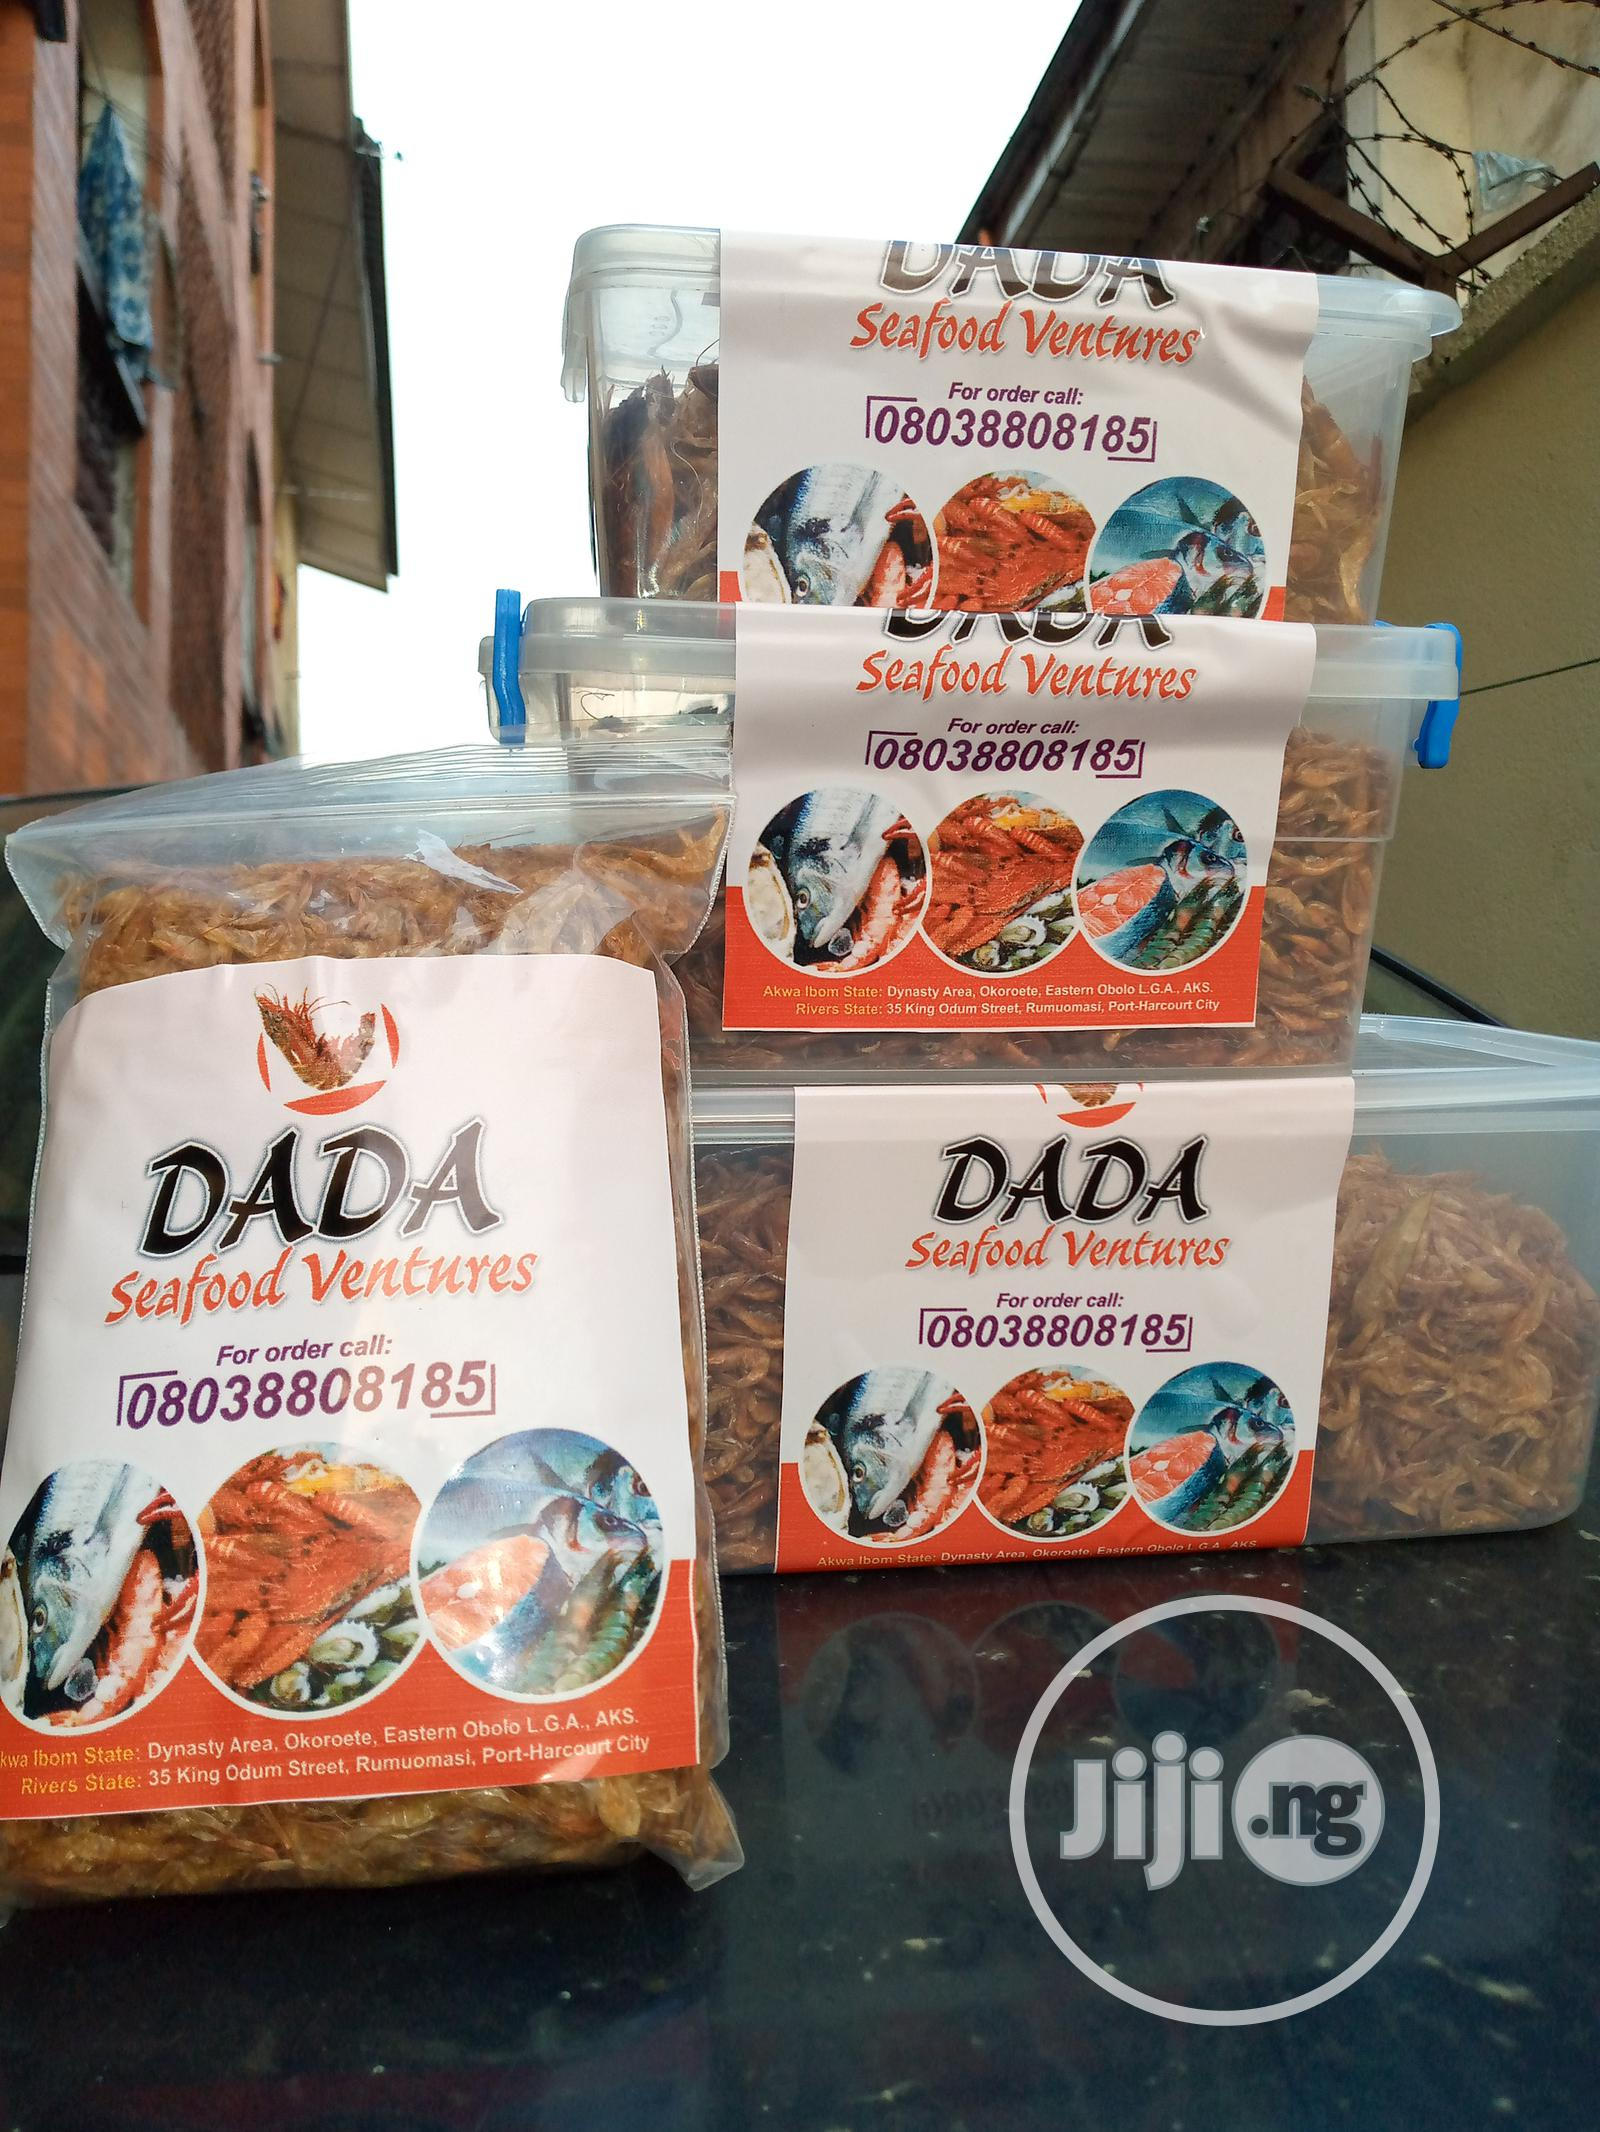 Archive: Dada Seafoods Venture